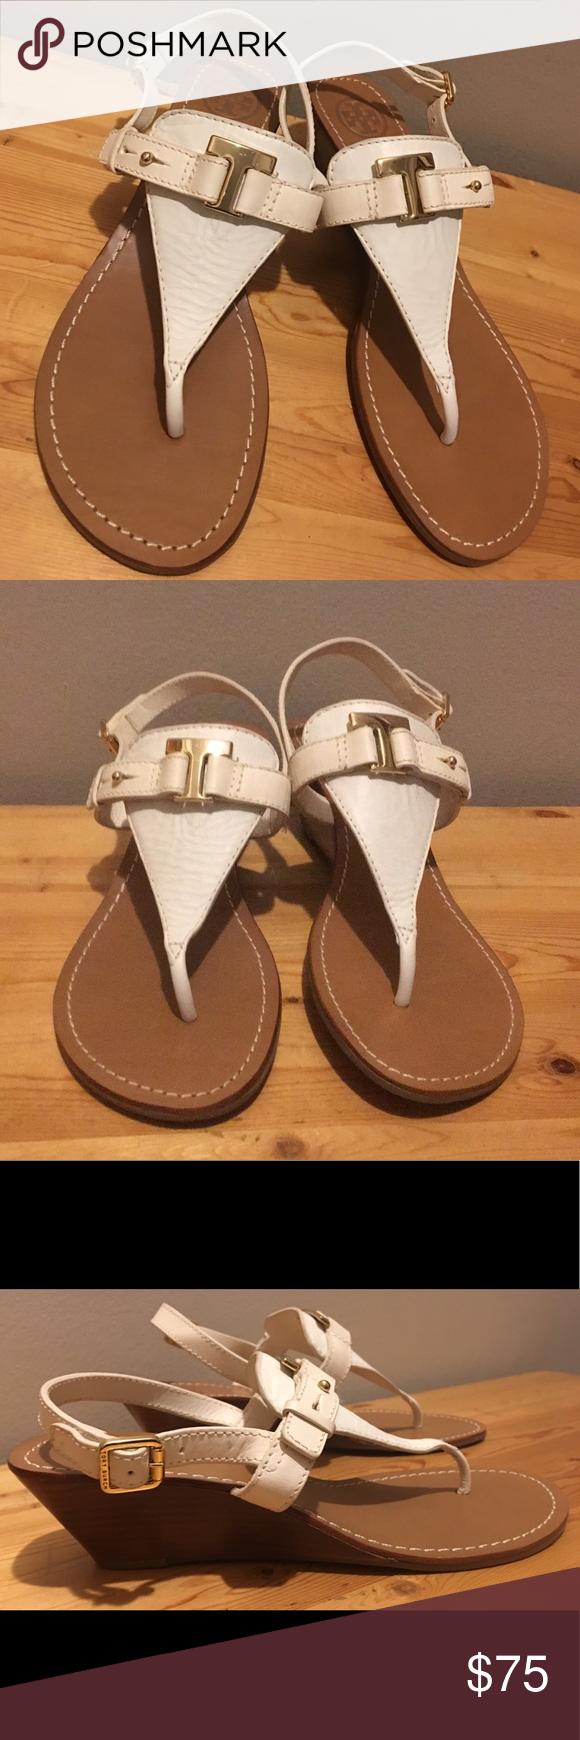 2c6a8d93187b TORY BURCH Casey T Wedge Sandals Size 8